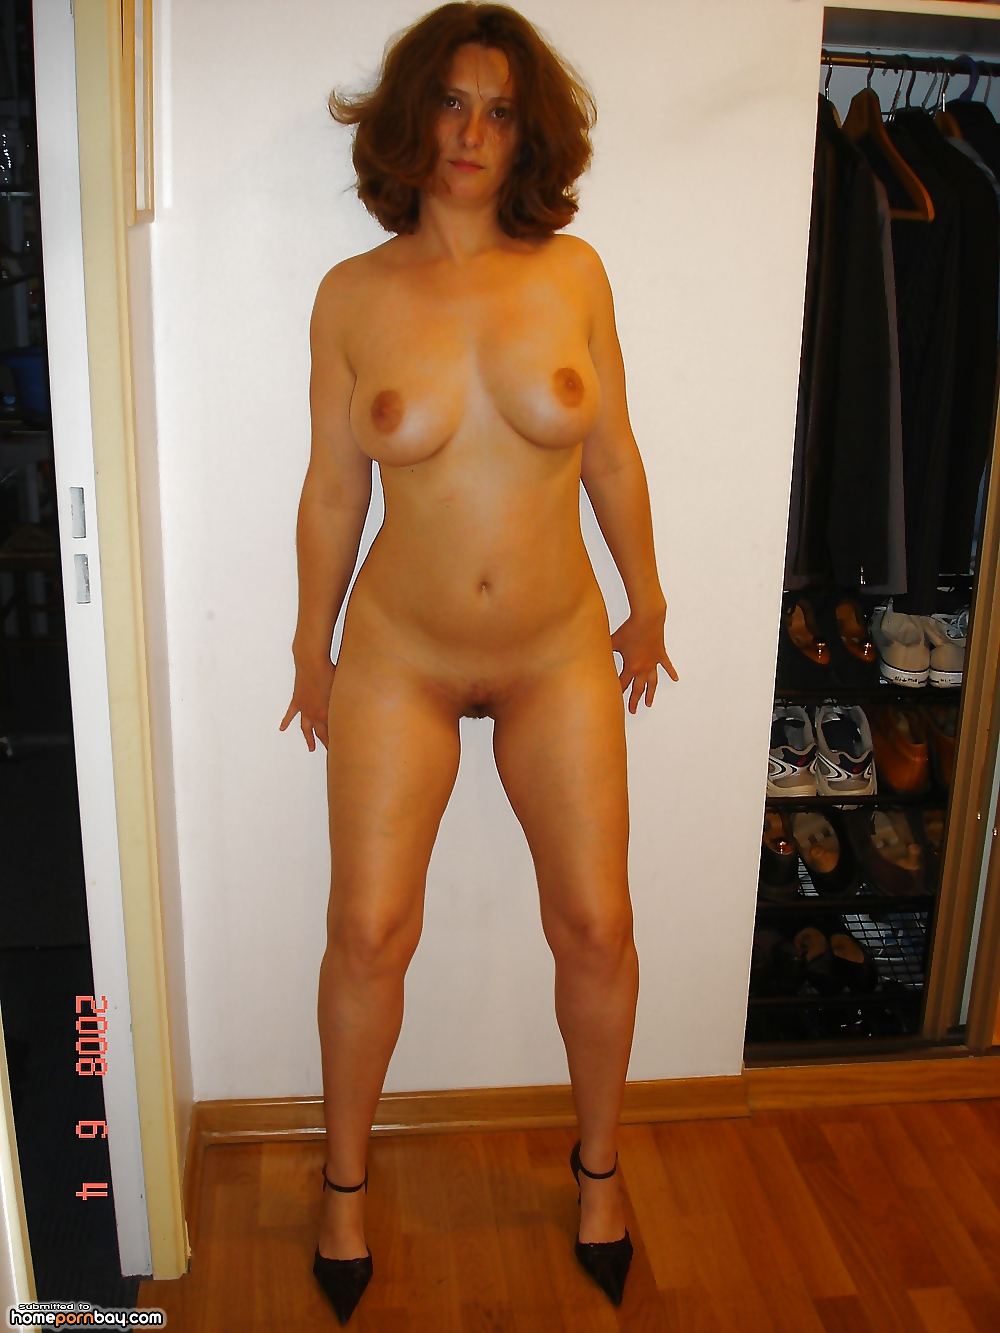 Tight body blonde milf bigtits